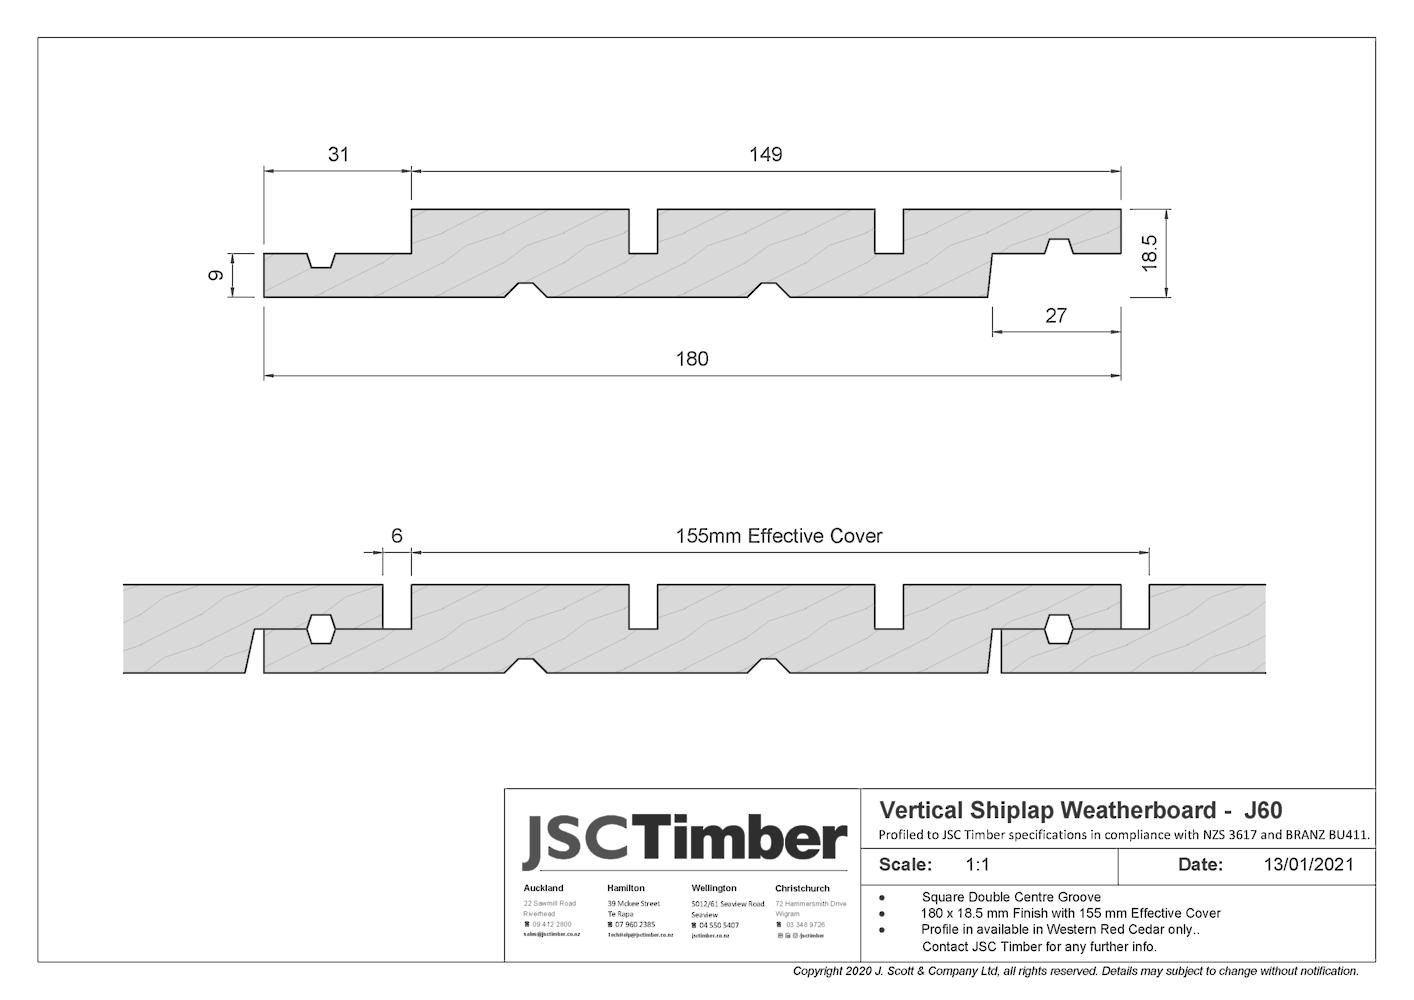 J60 Vertical Shiplap Weatherboard